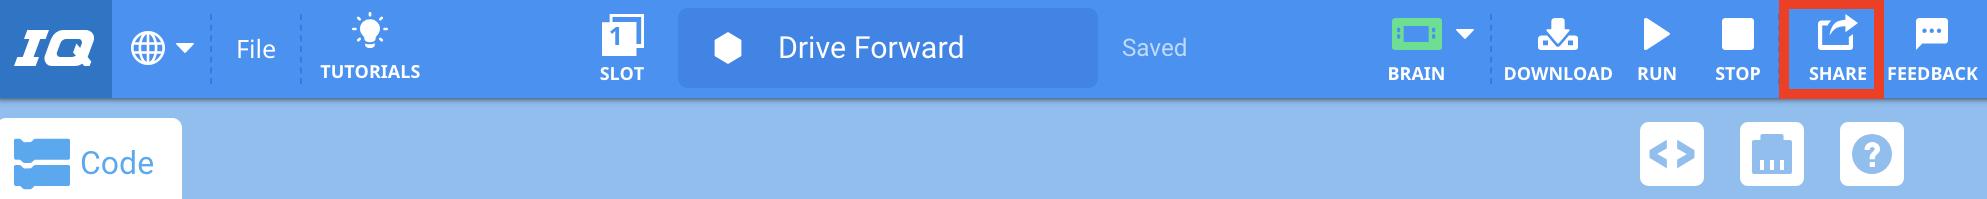 Drive_Forward_IQ_Toolbar.png